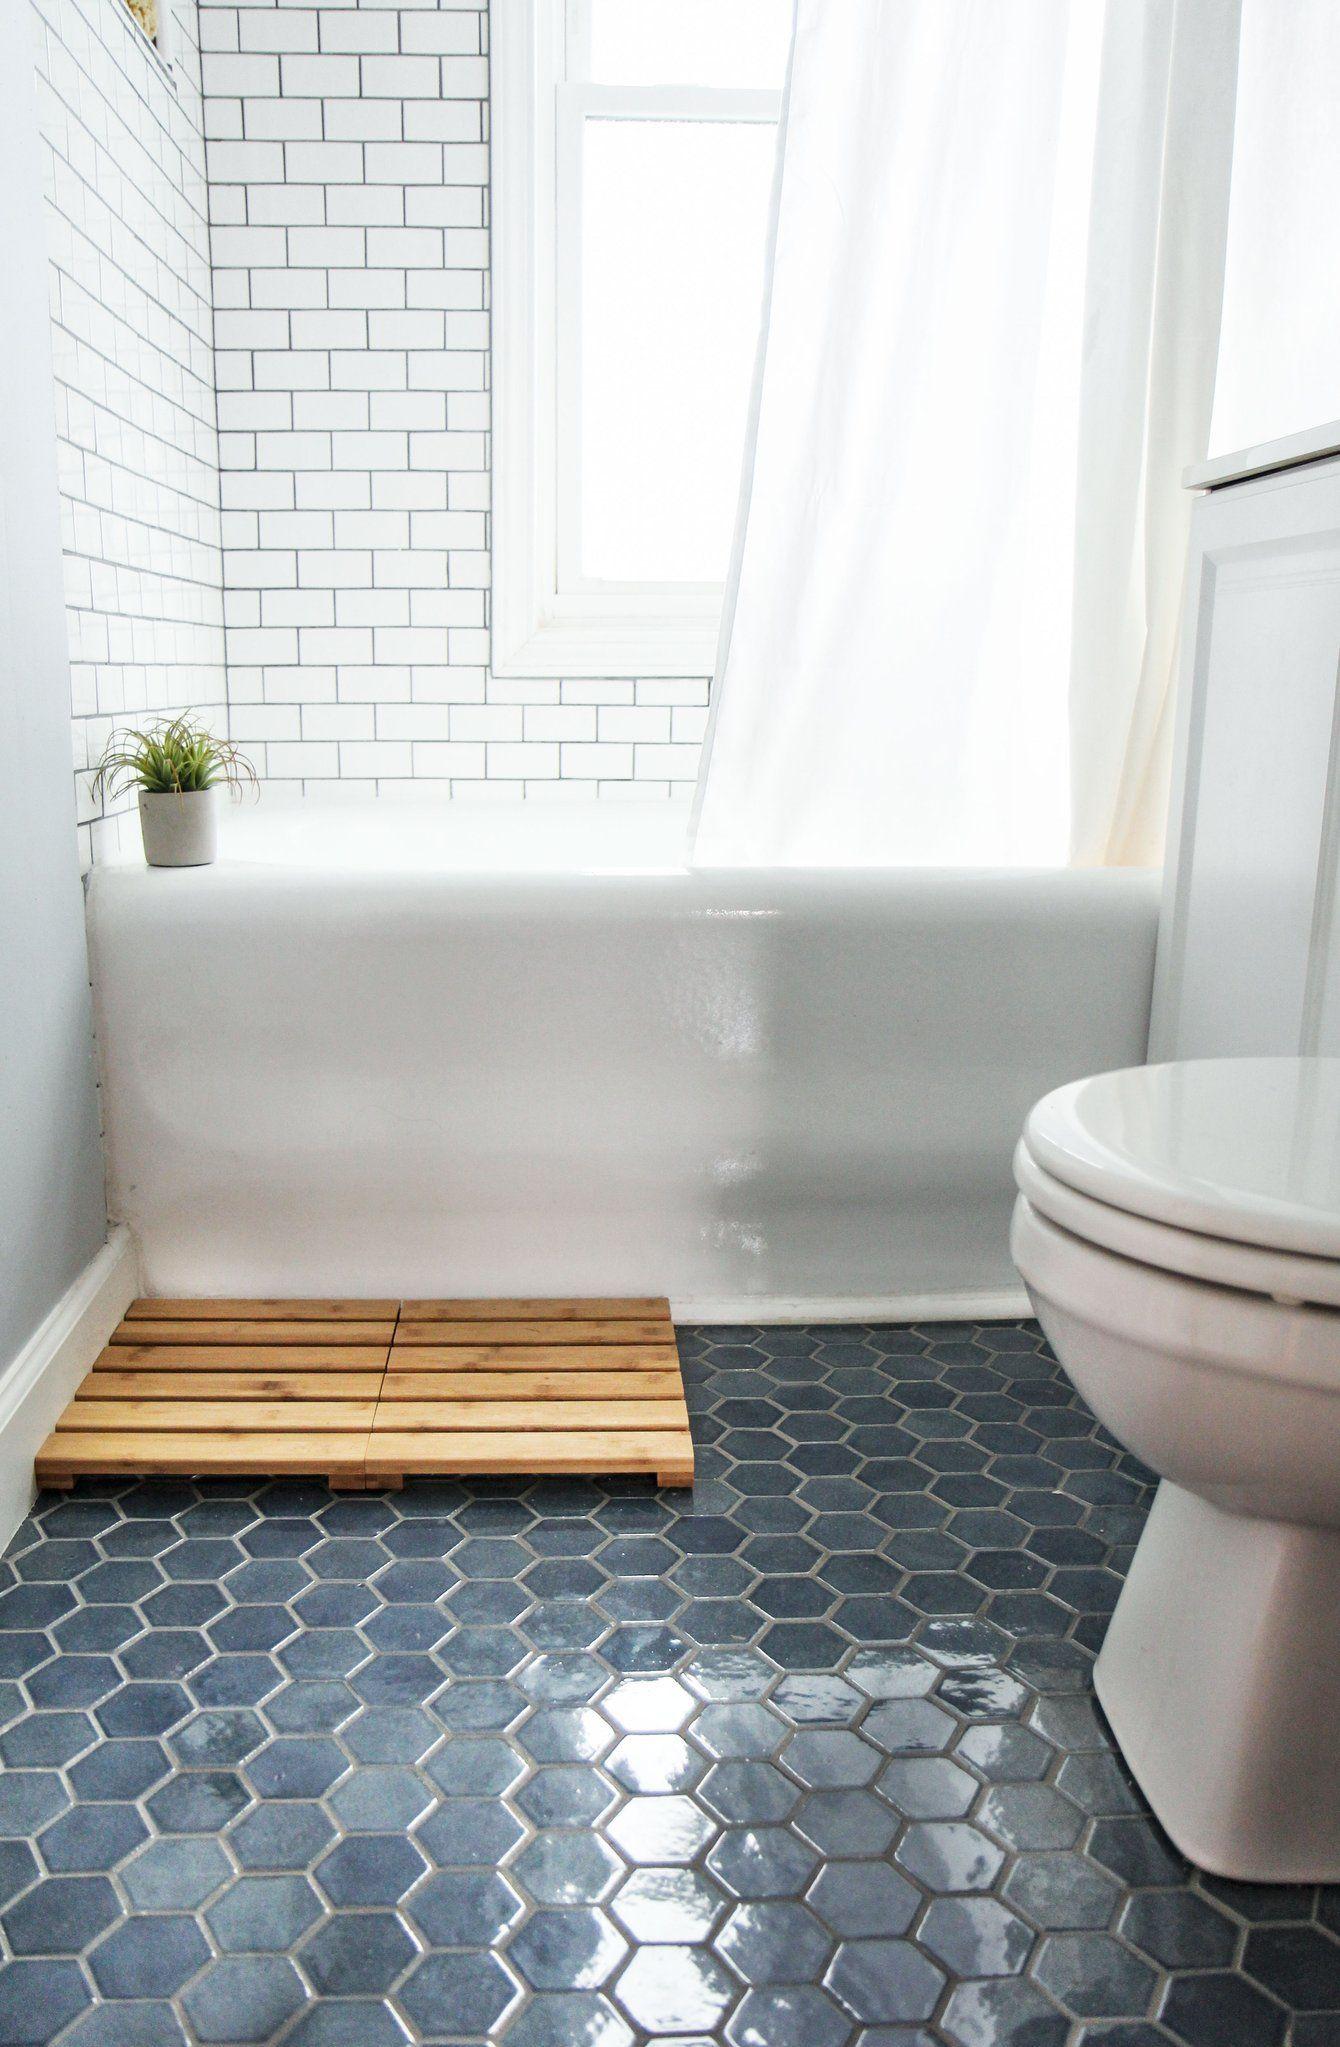 Blue Hexagon Floor Tile Bathrooms Floor Tile Home Decor Designs Ideas Bathroom Tile Renovation Tile Renovation Tile Bathroom